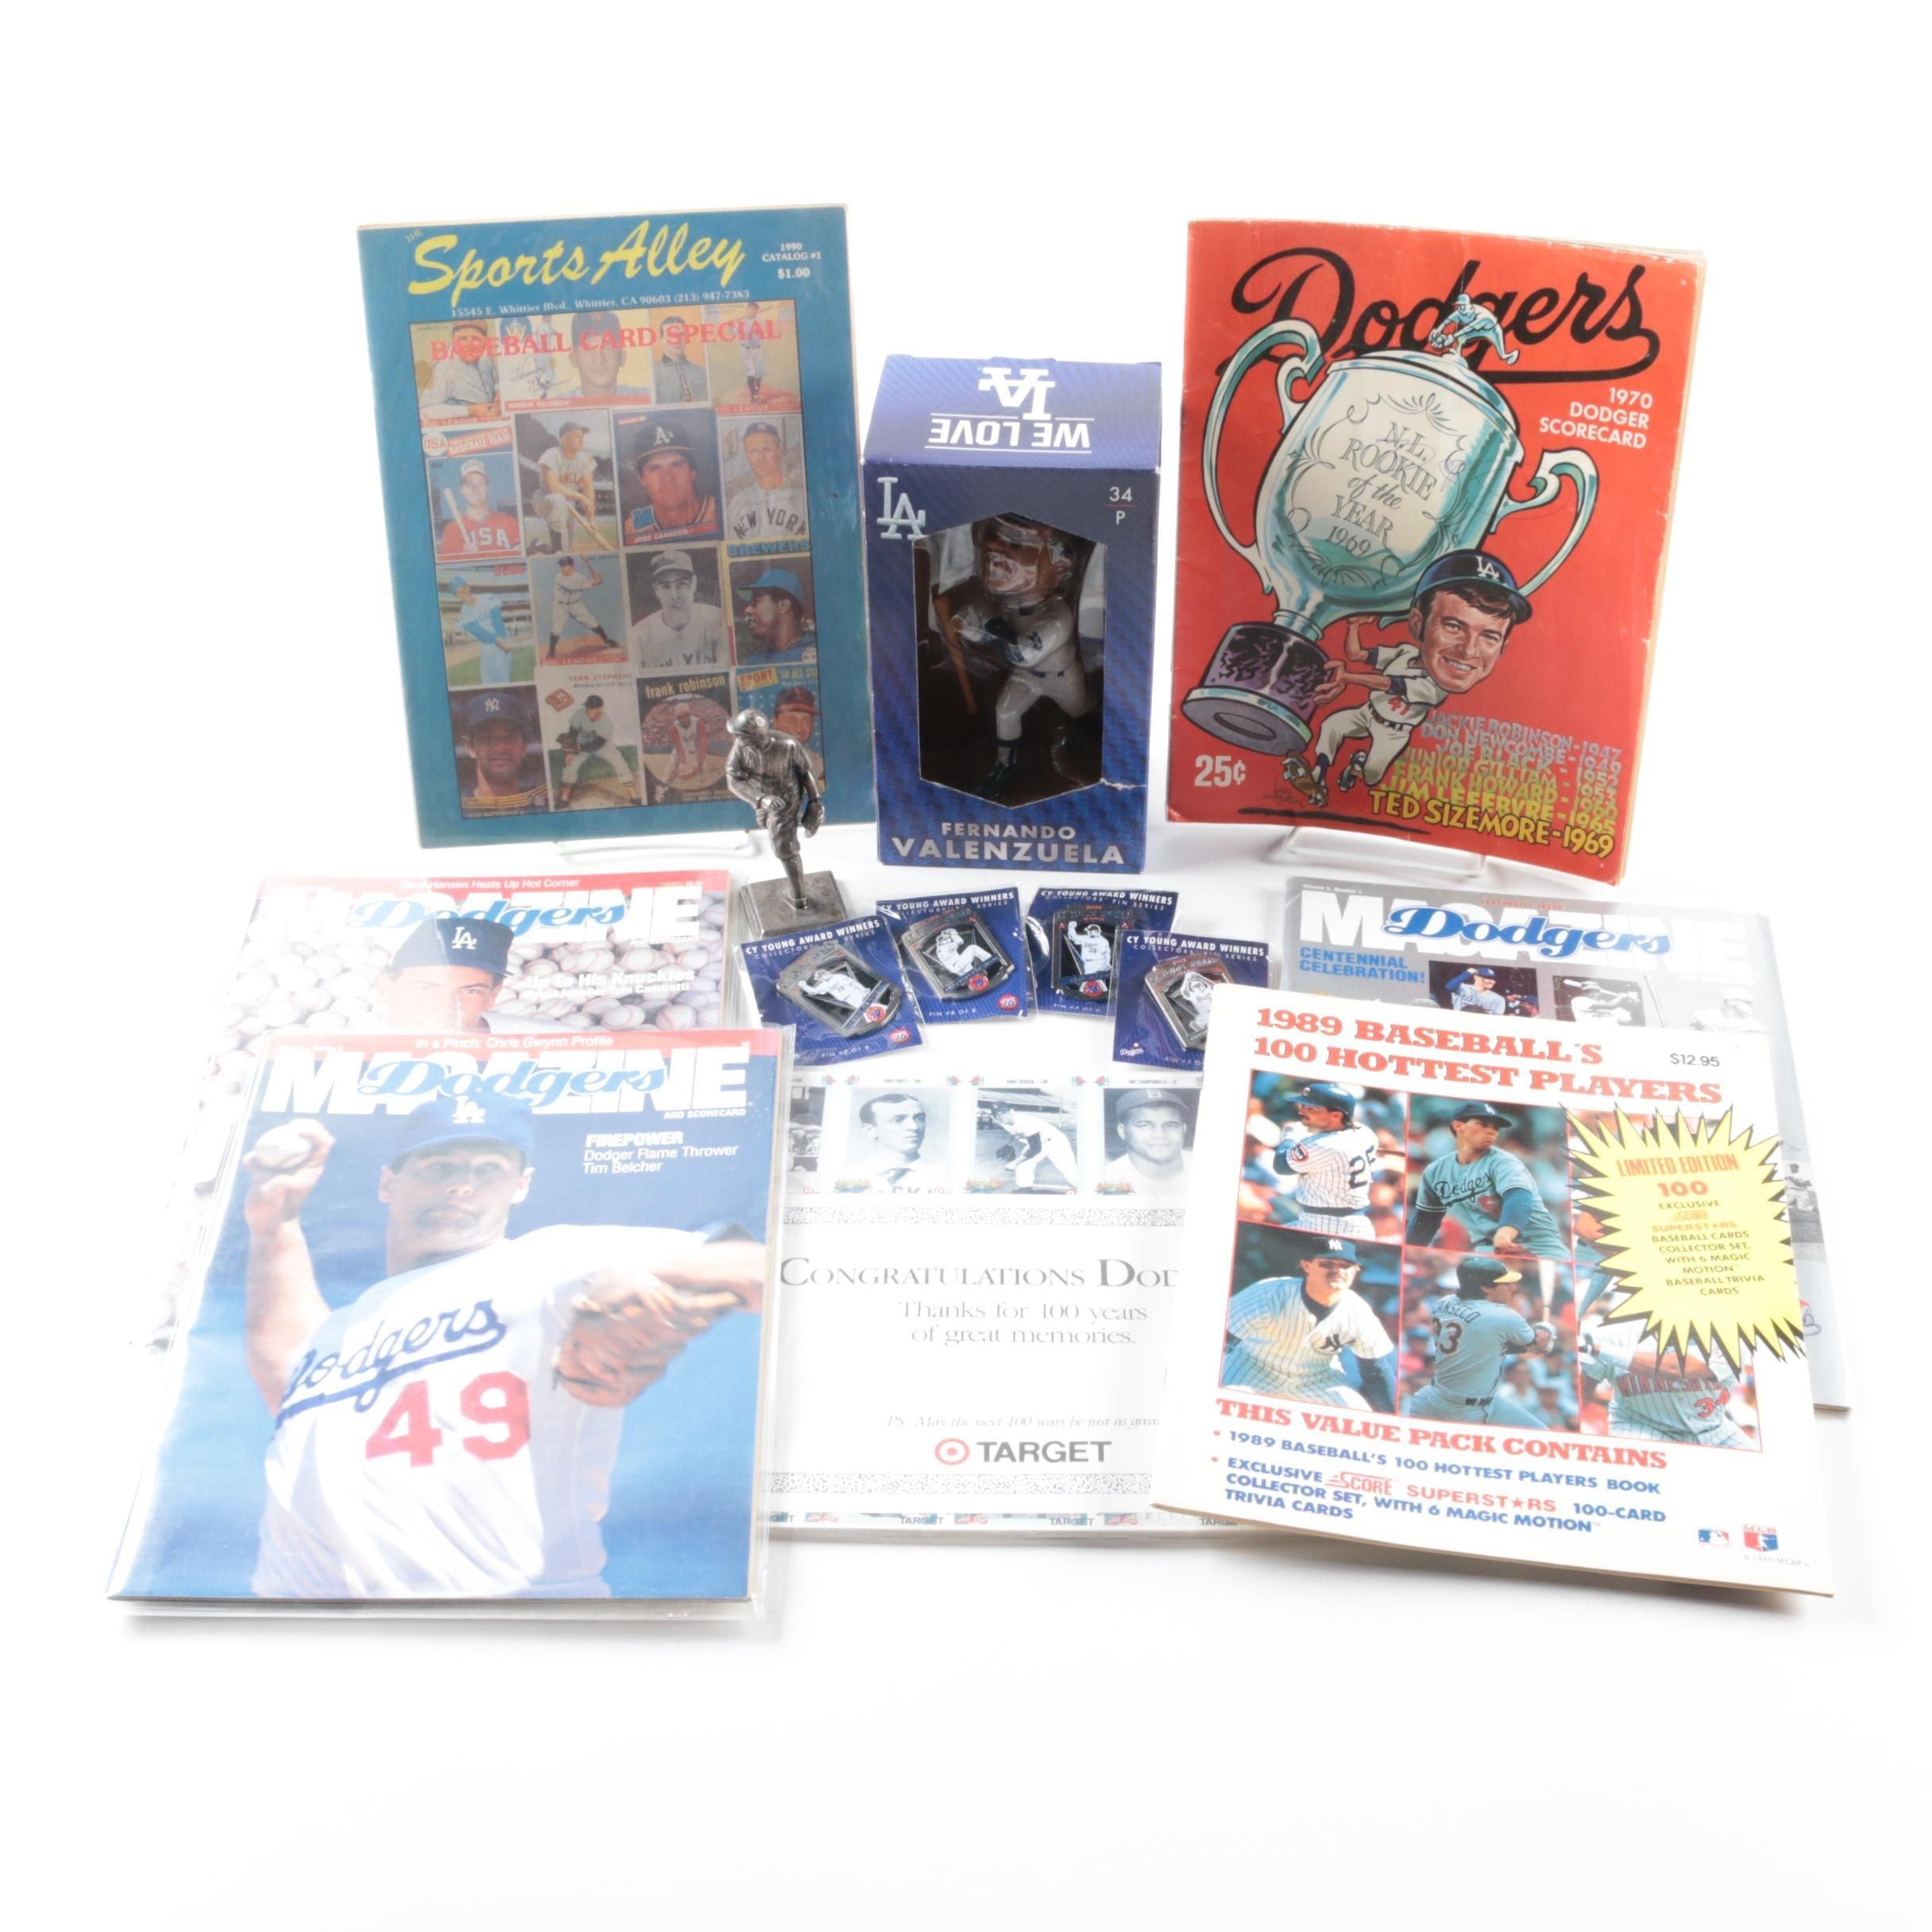 Los Angeles Dodgers and Assorted Baseball Memorabilia